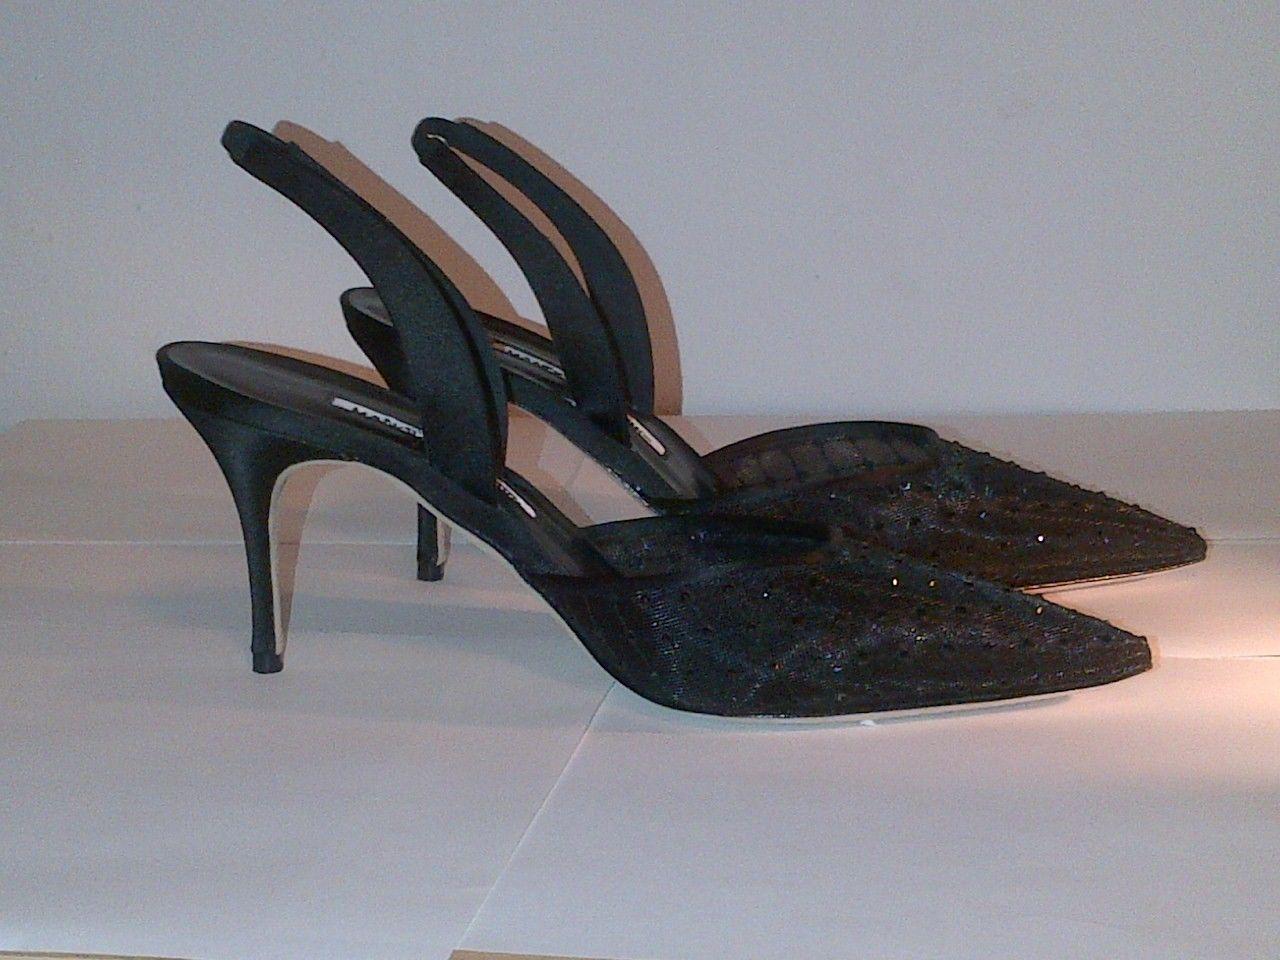 "SOLD!!! NEW! Manolo Blahnik ""Guru"" Heels Satin trim and Swarovski crystals on lace mesh. Satin heel and slingback strap. Size 40.5/U.S. 9.5 RETAIL: $1,125 OUR PRICE: $450"